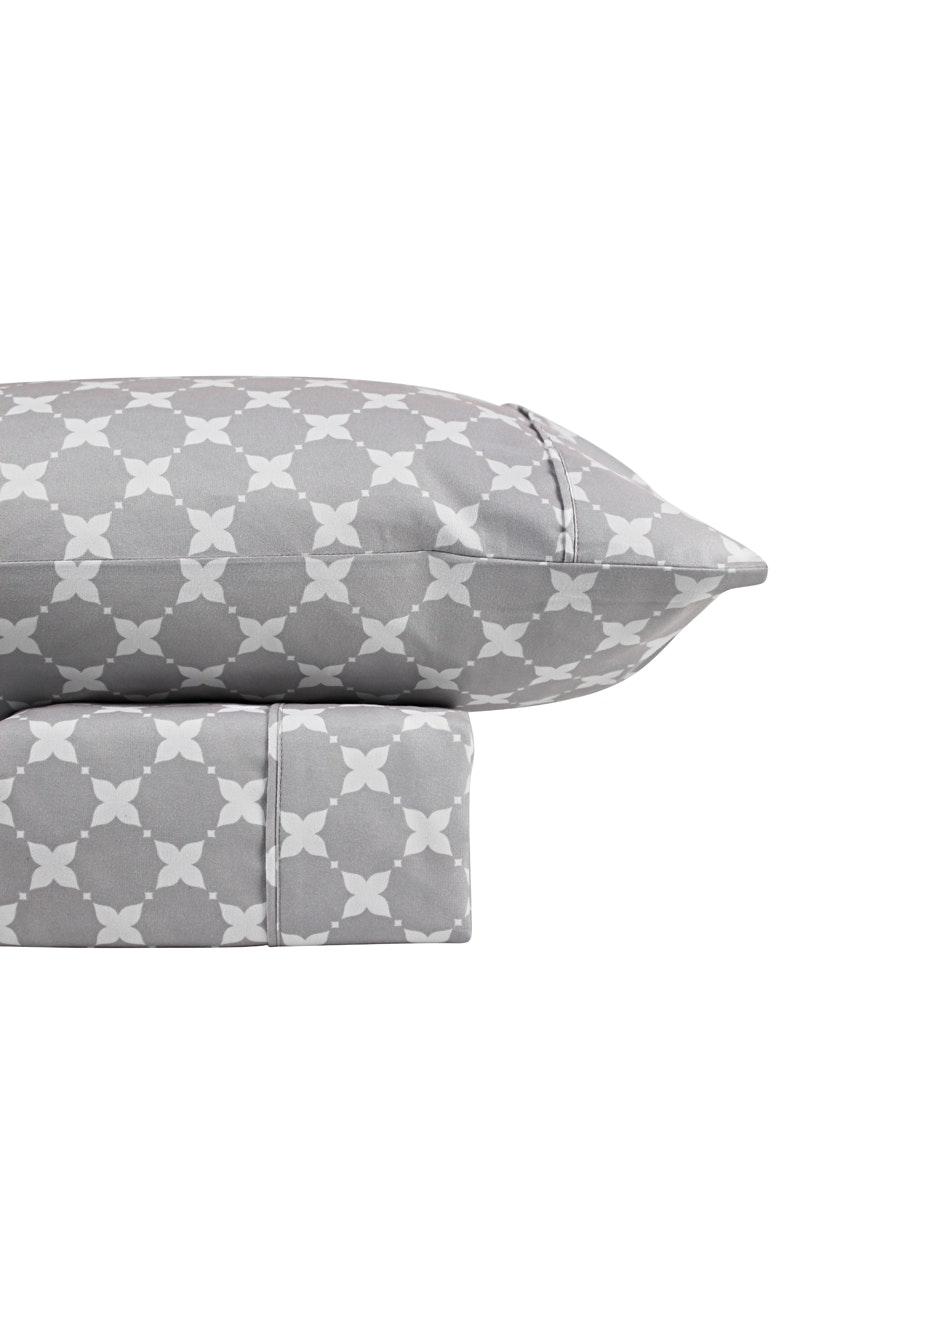 Thermal Flannel Sheet Sets - Aspen Design - Glacier - Double Bed